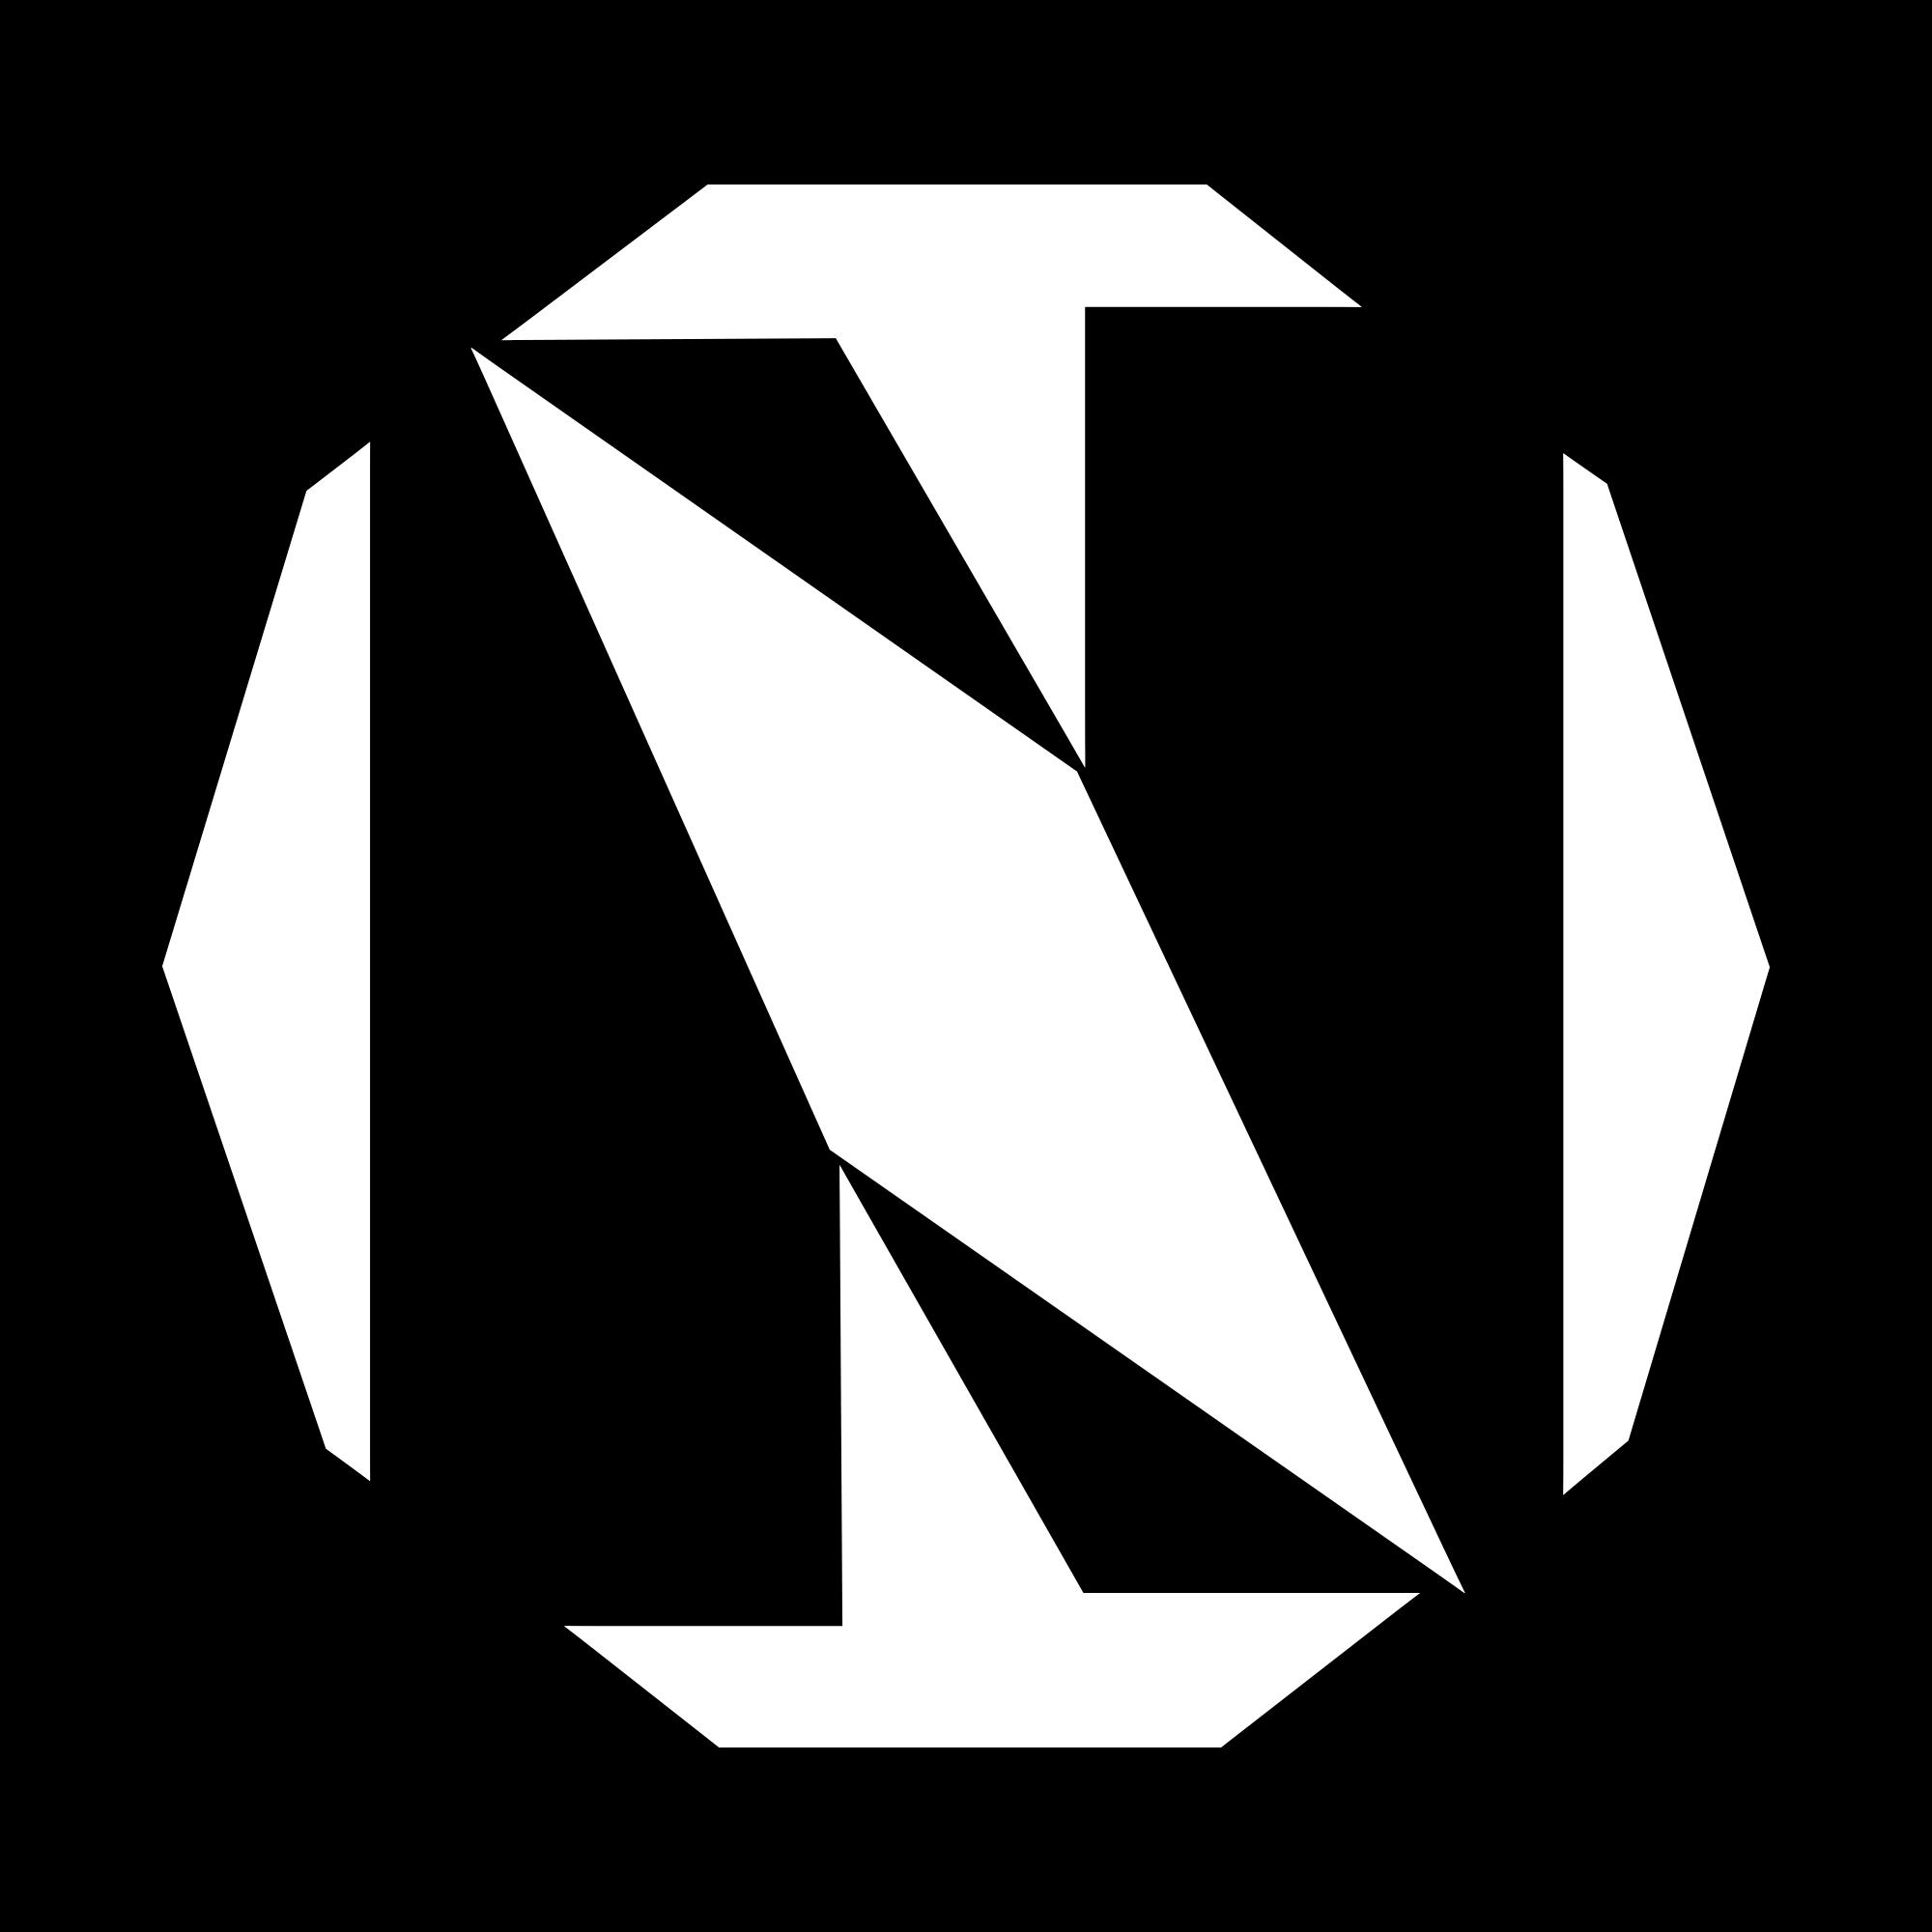 @nots.corp (nots) Profile Image | Linktree